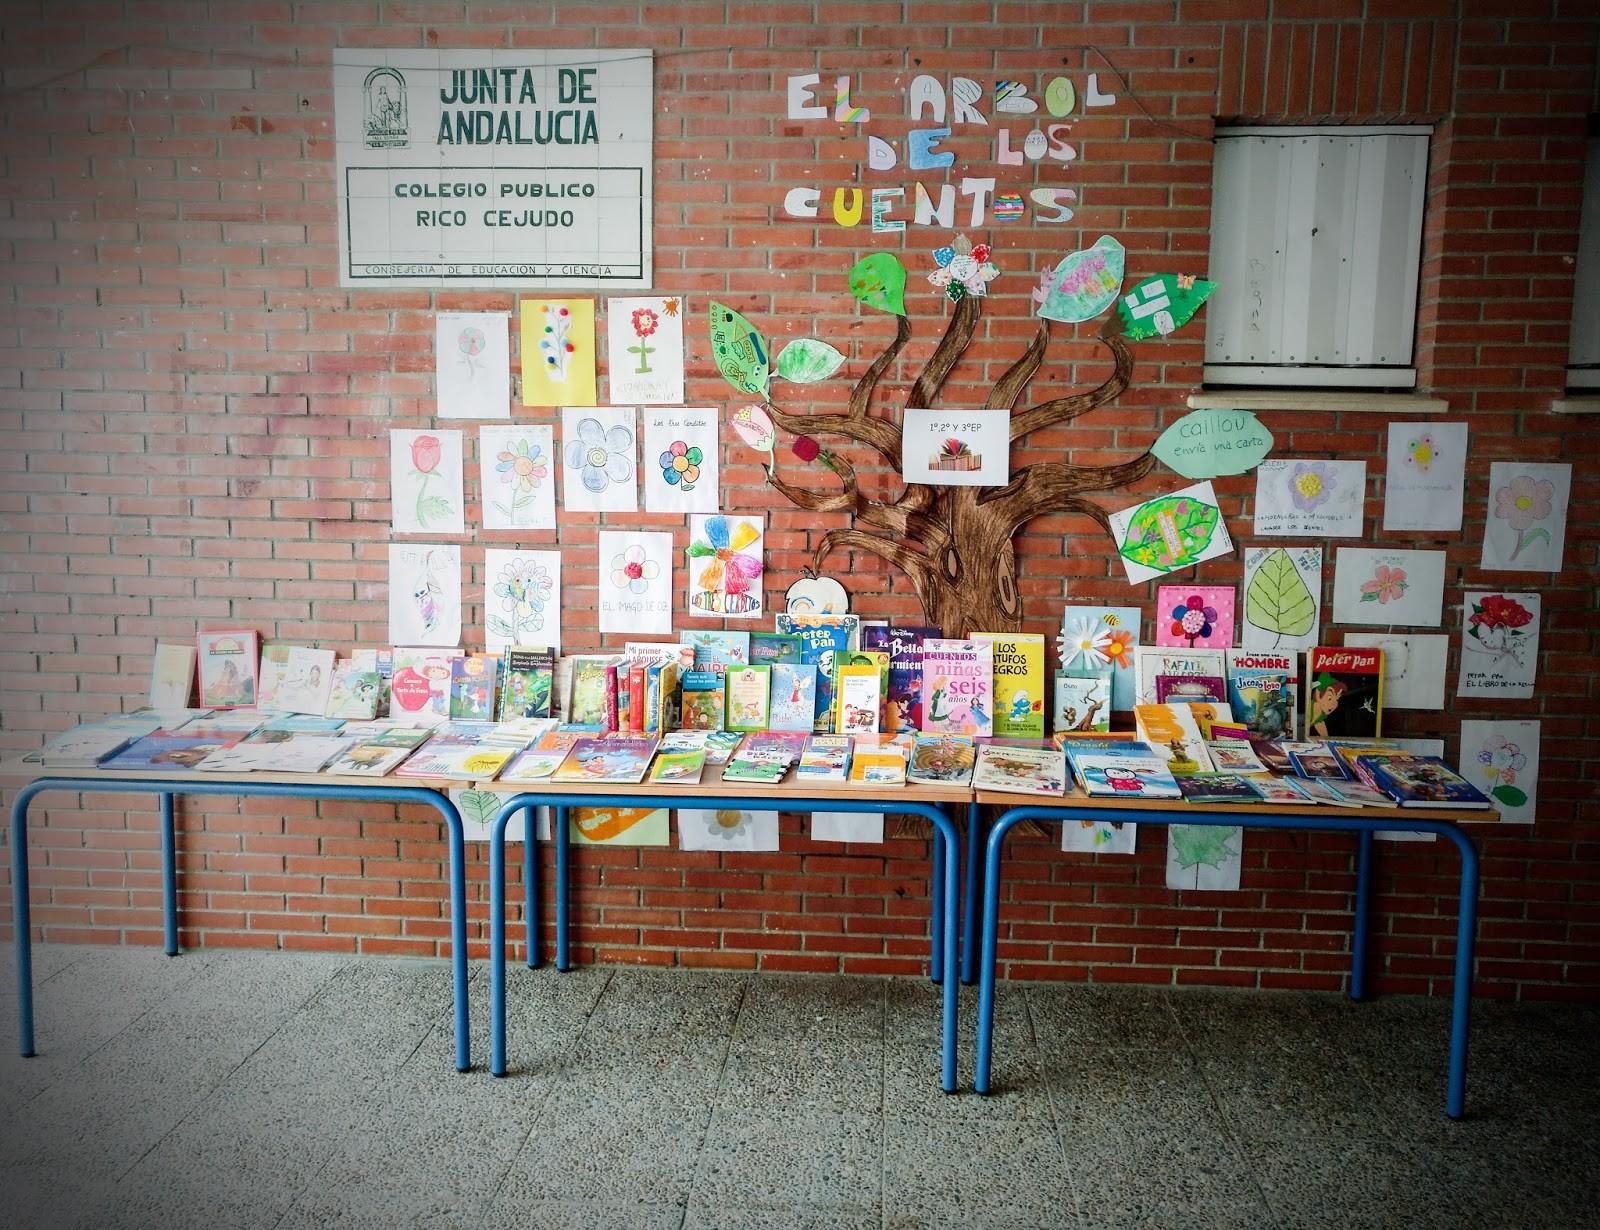 Calendario Escolar 2019 Junta De andalucia Recientes Ampa La Drsena Abril 2018